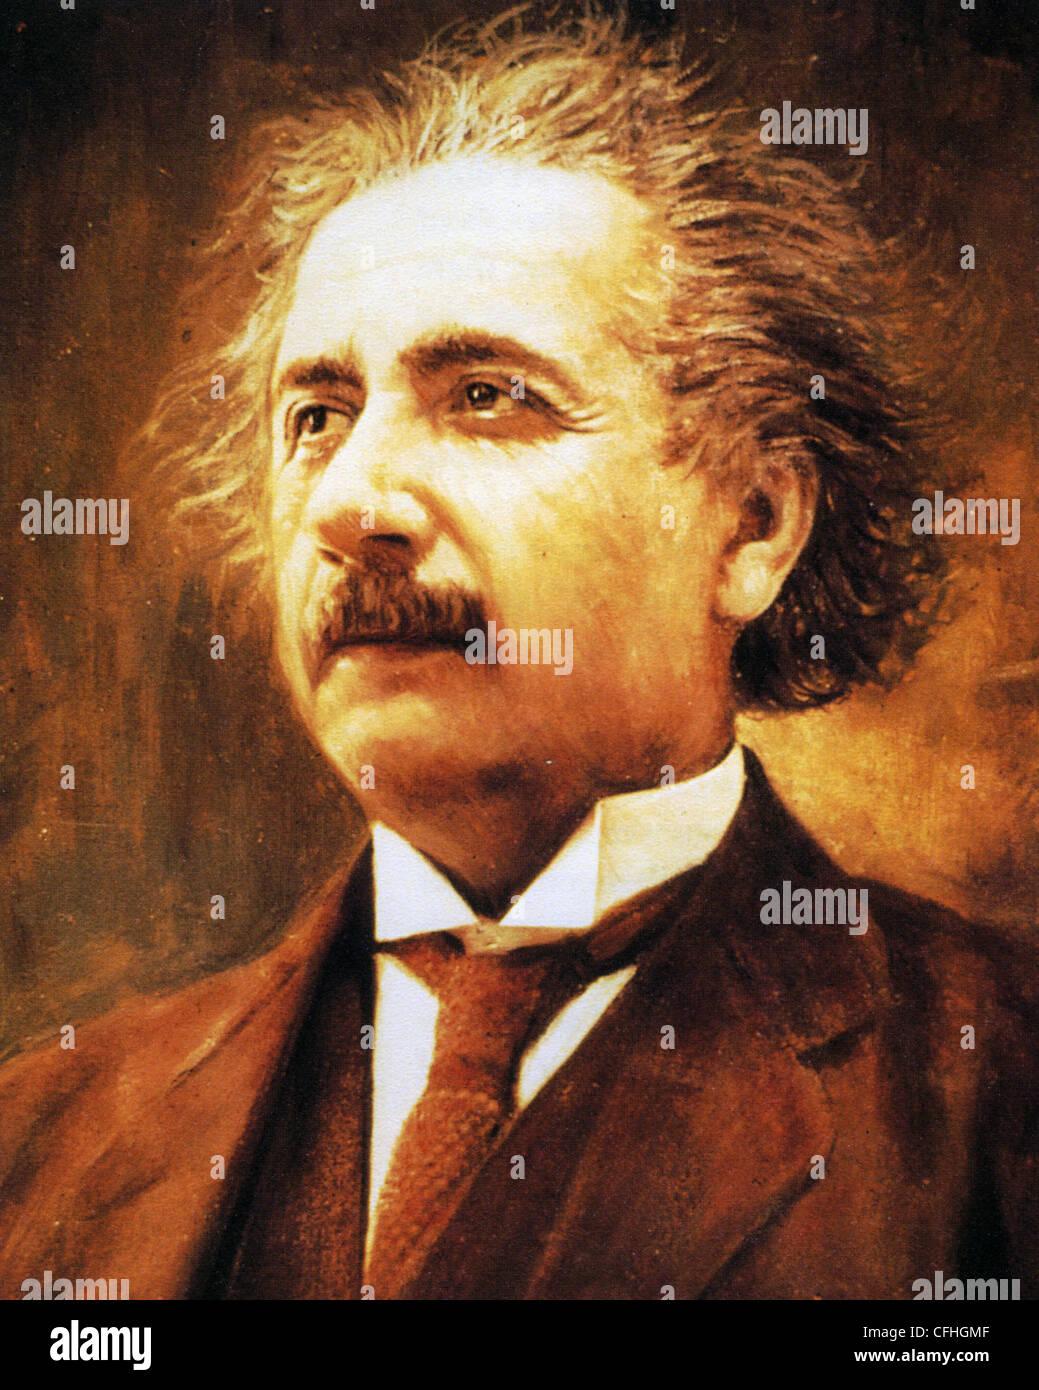 ALBERT Einstein (1879-1955) físico teórico nacido en Alemania Foto de stock